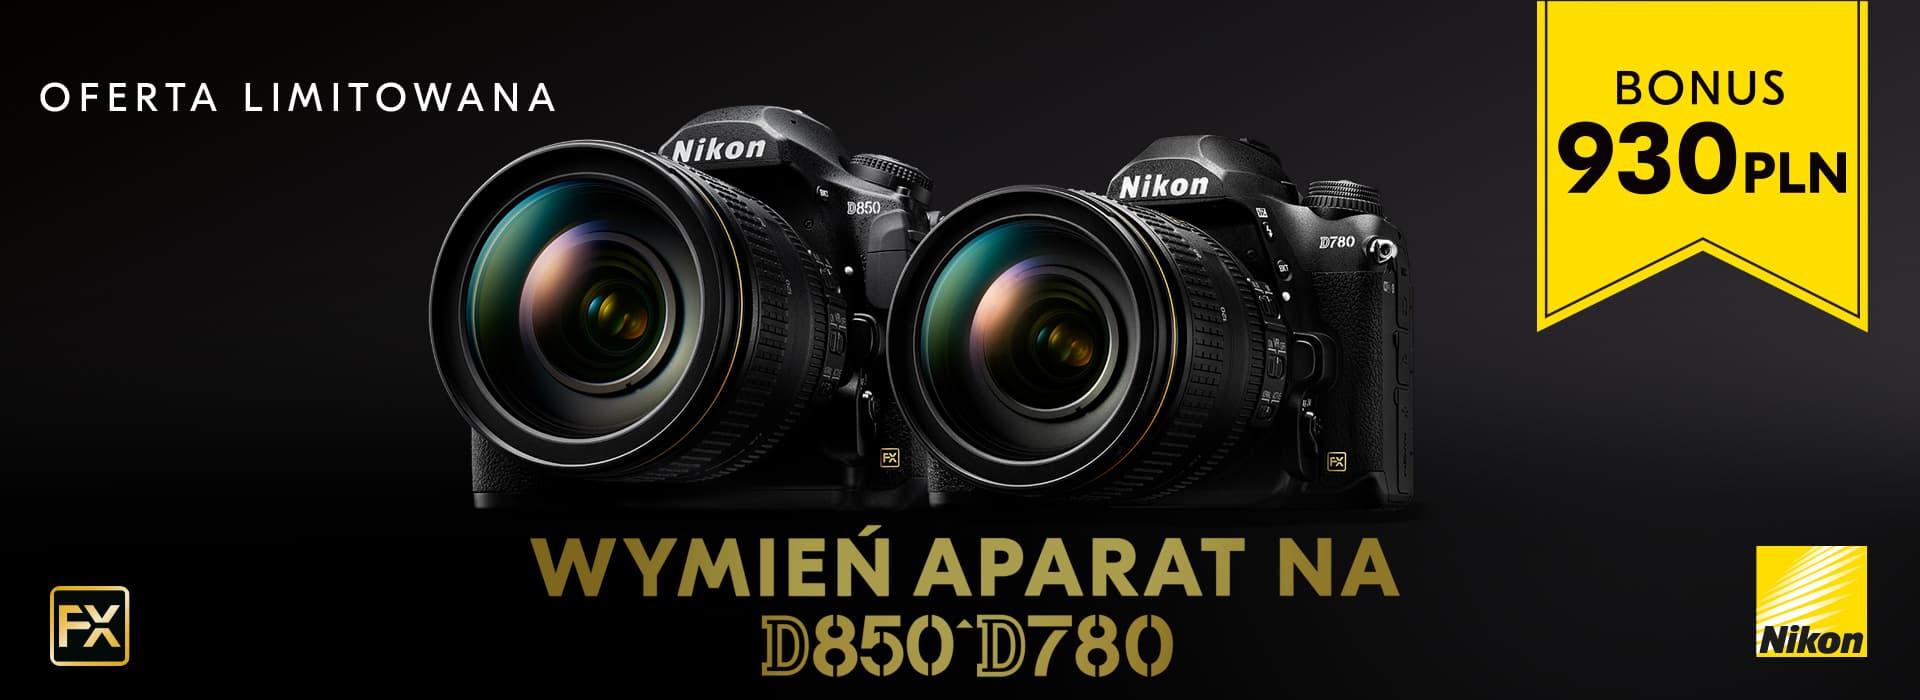 1170x350-FX3-1c.jpg